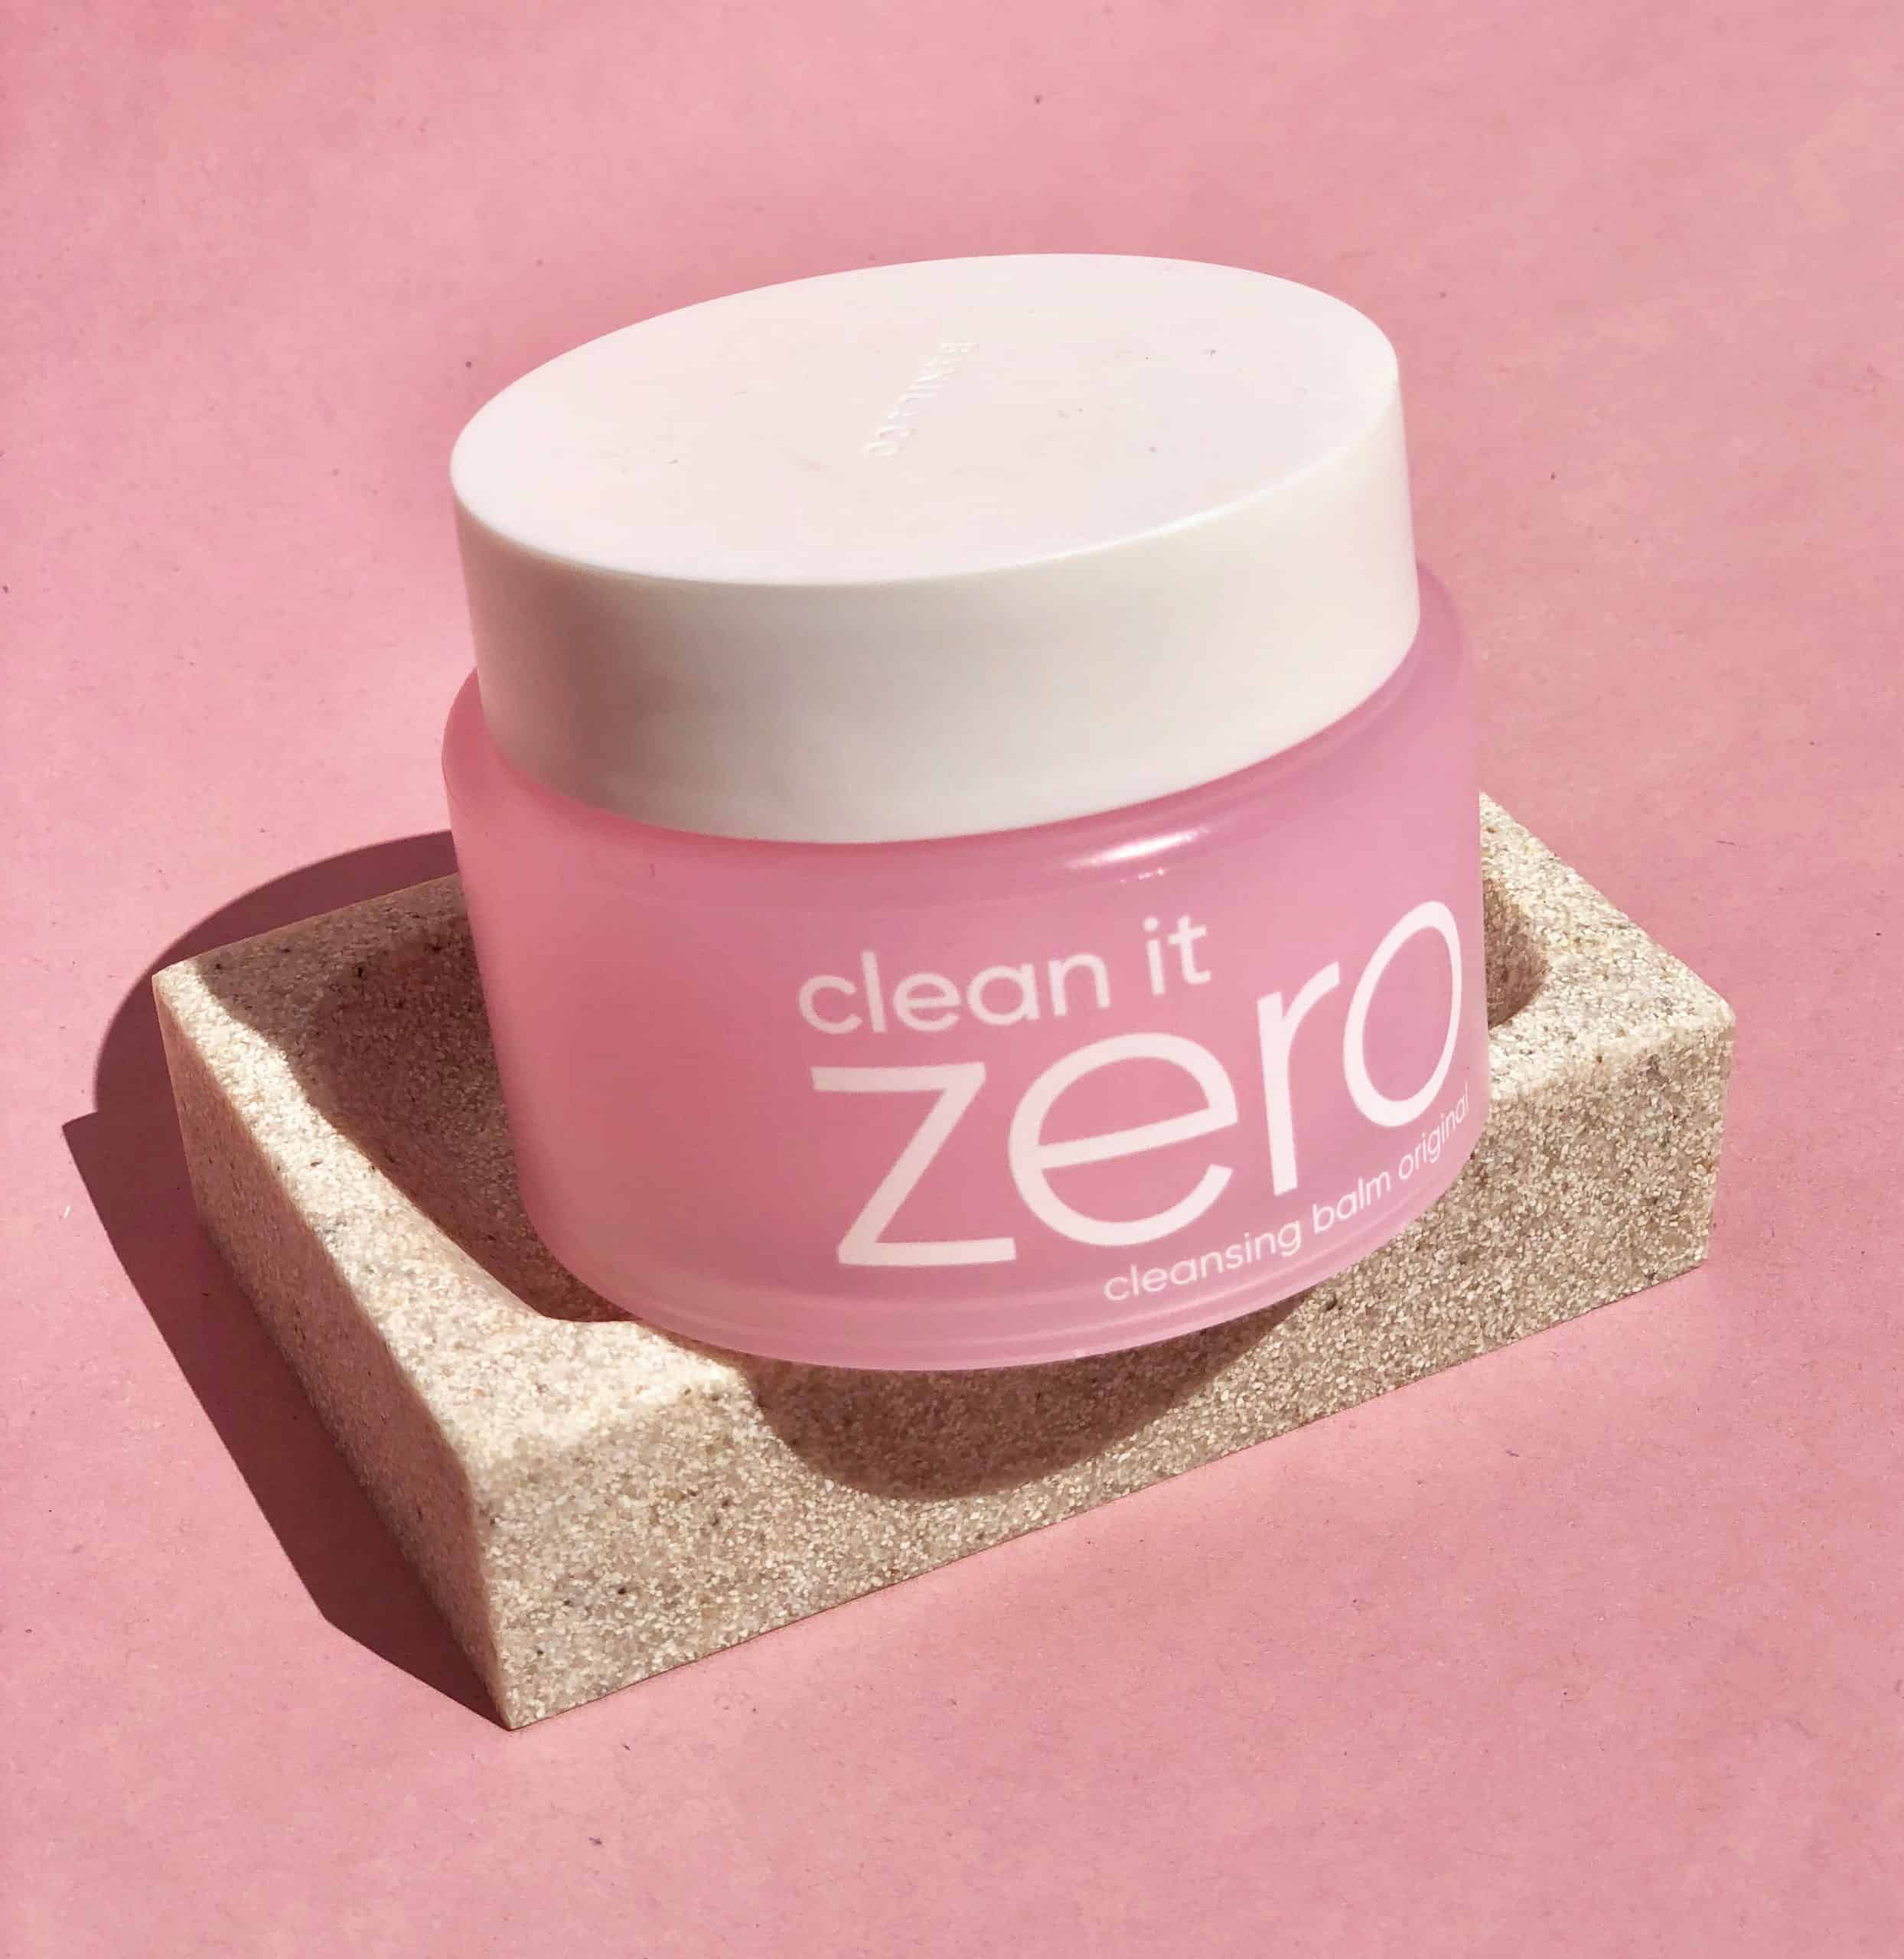 Clean It Zero Original Cleansing Balm scaled